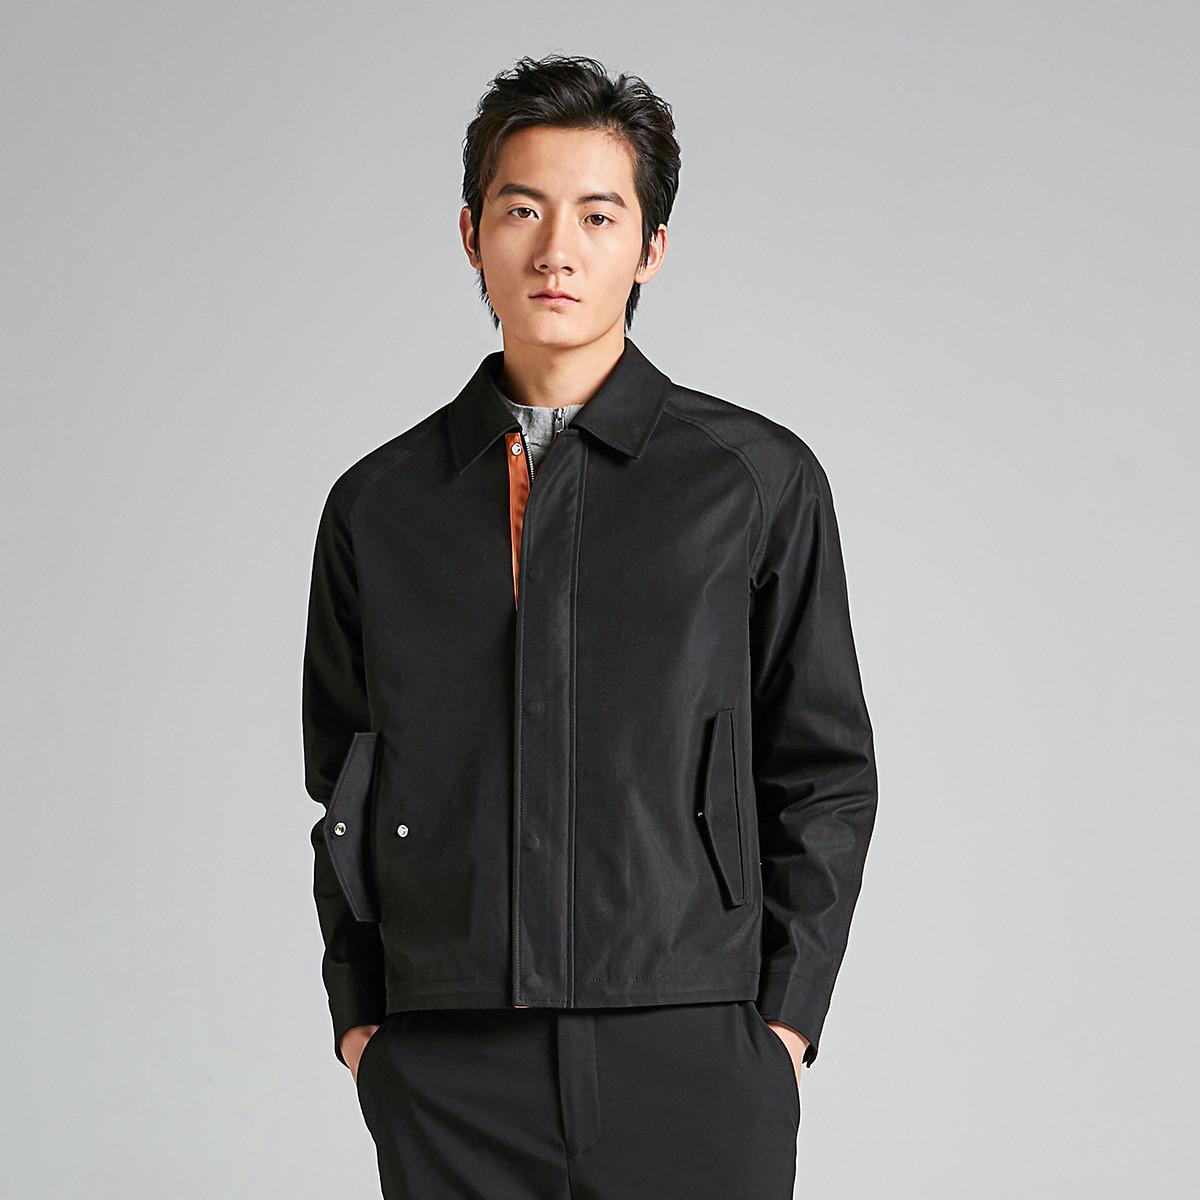 KINBAT 劲霸 JKDC1311E01 男士夹克外套